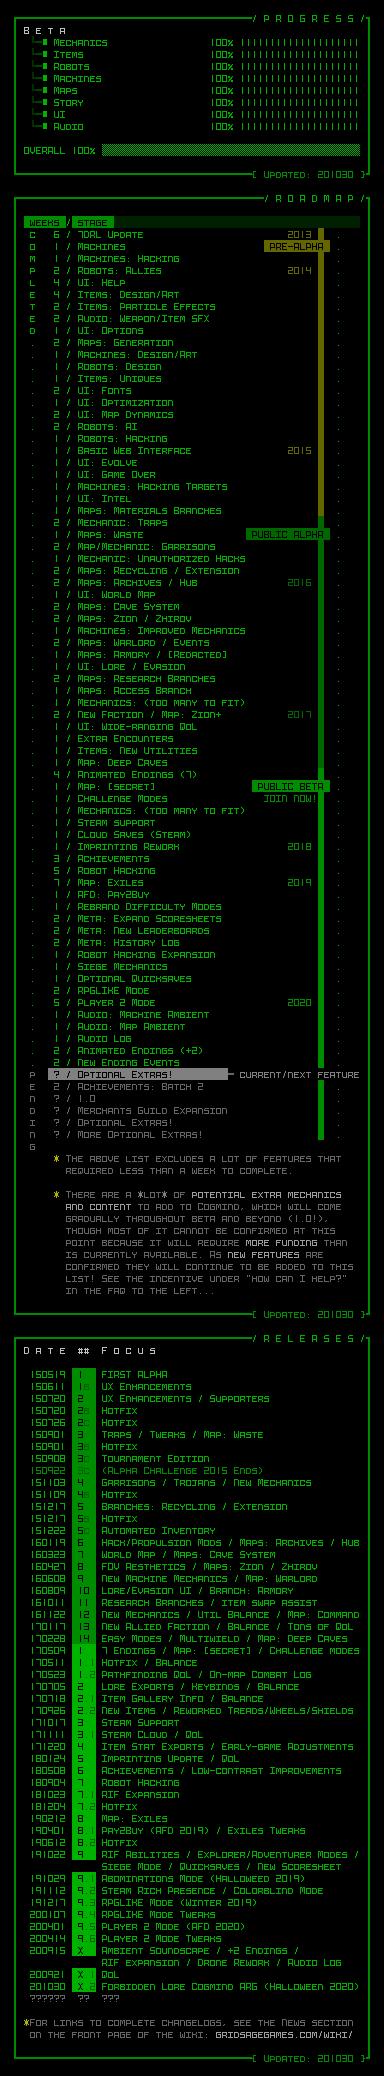 cogmind_dev_roadmap_201030